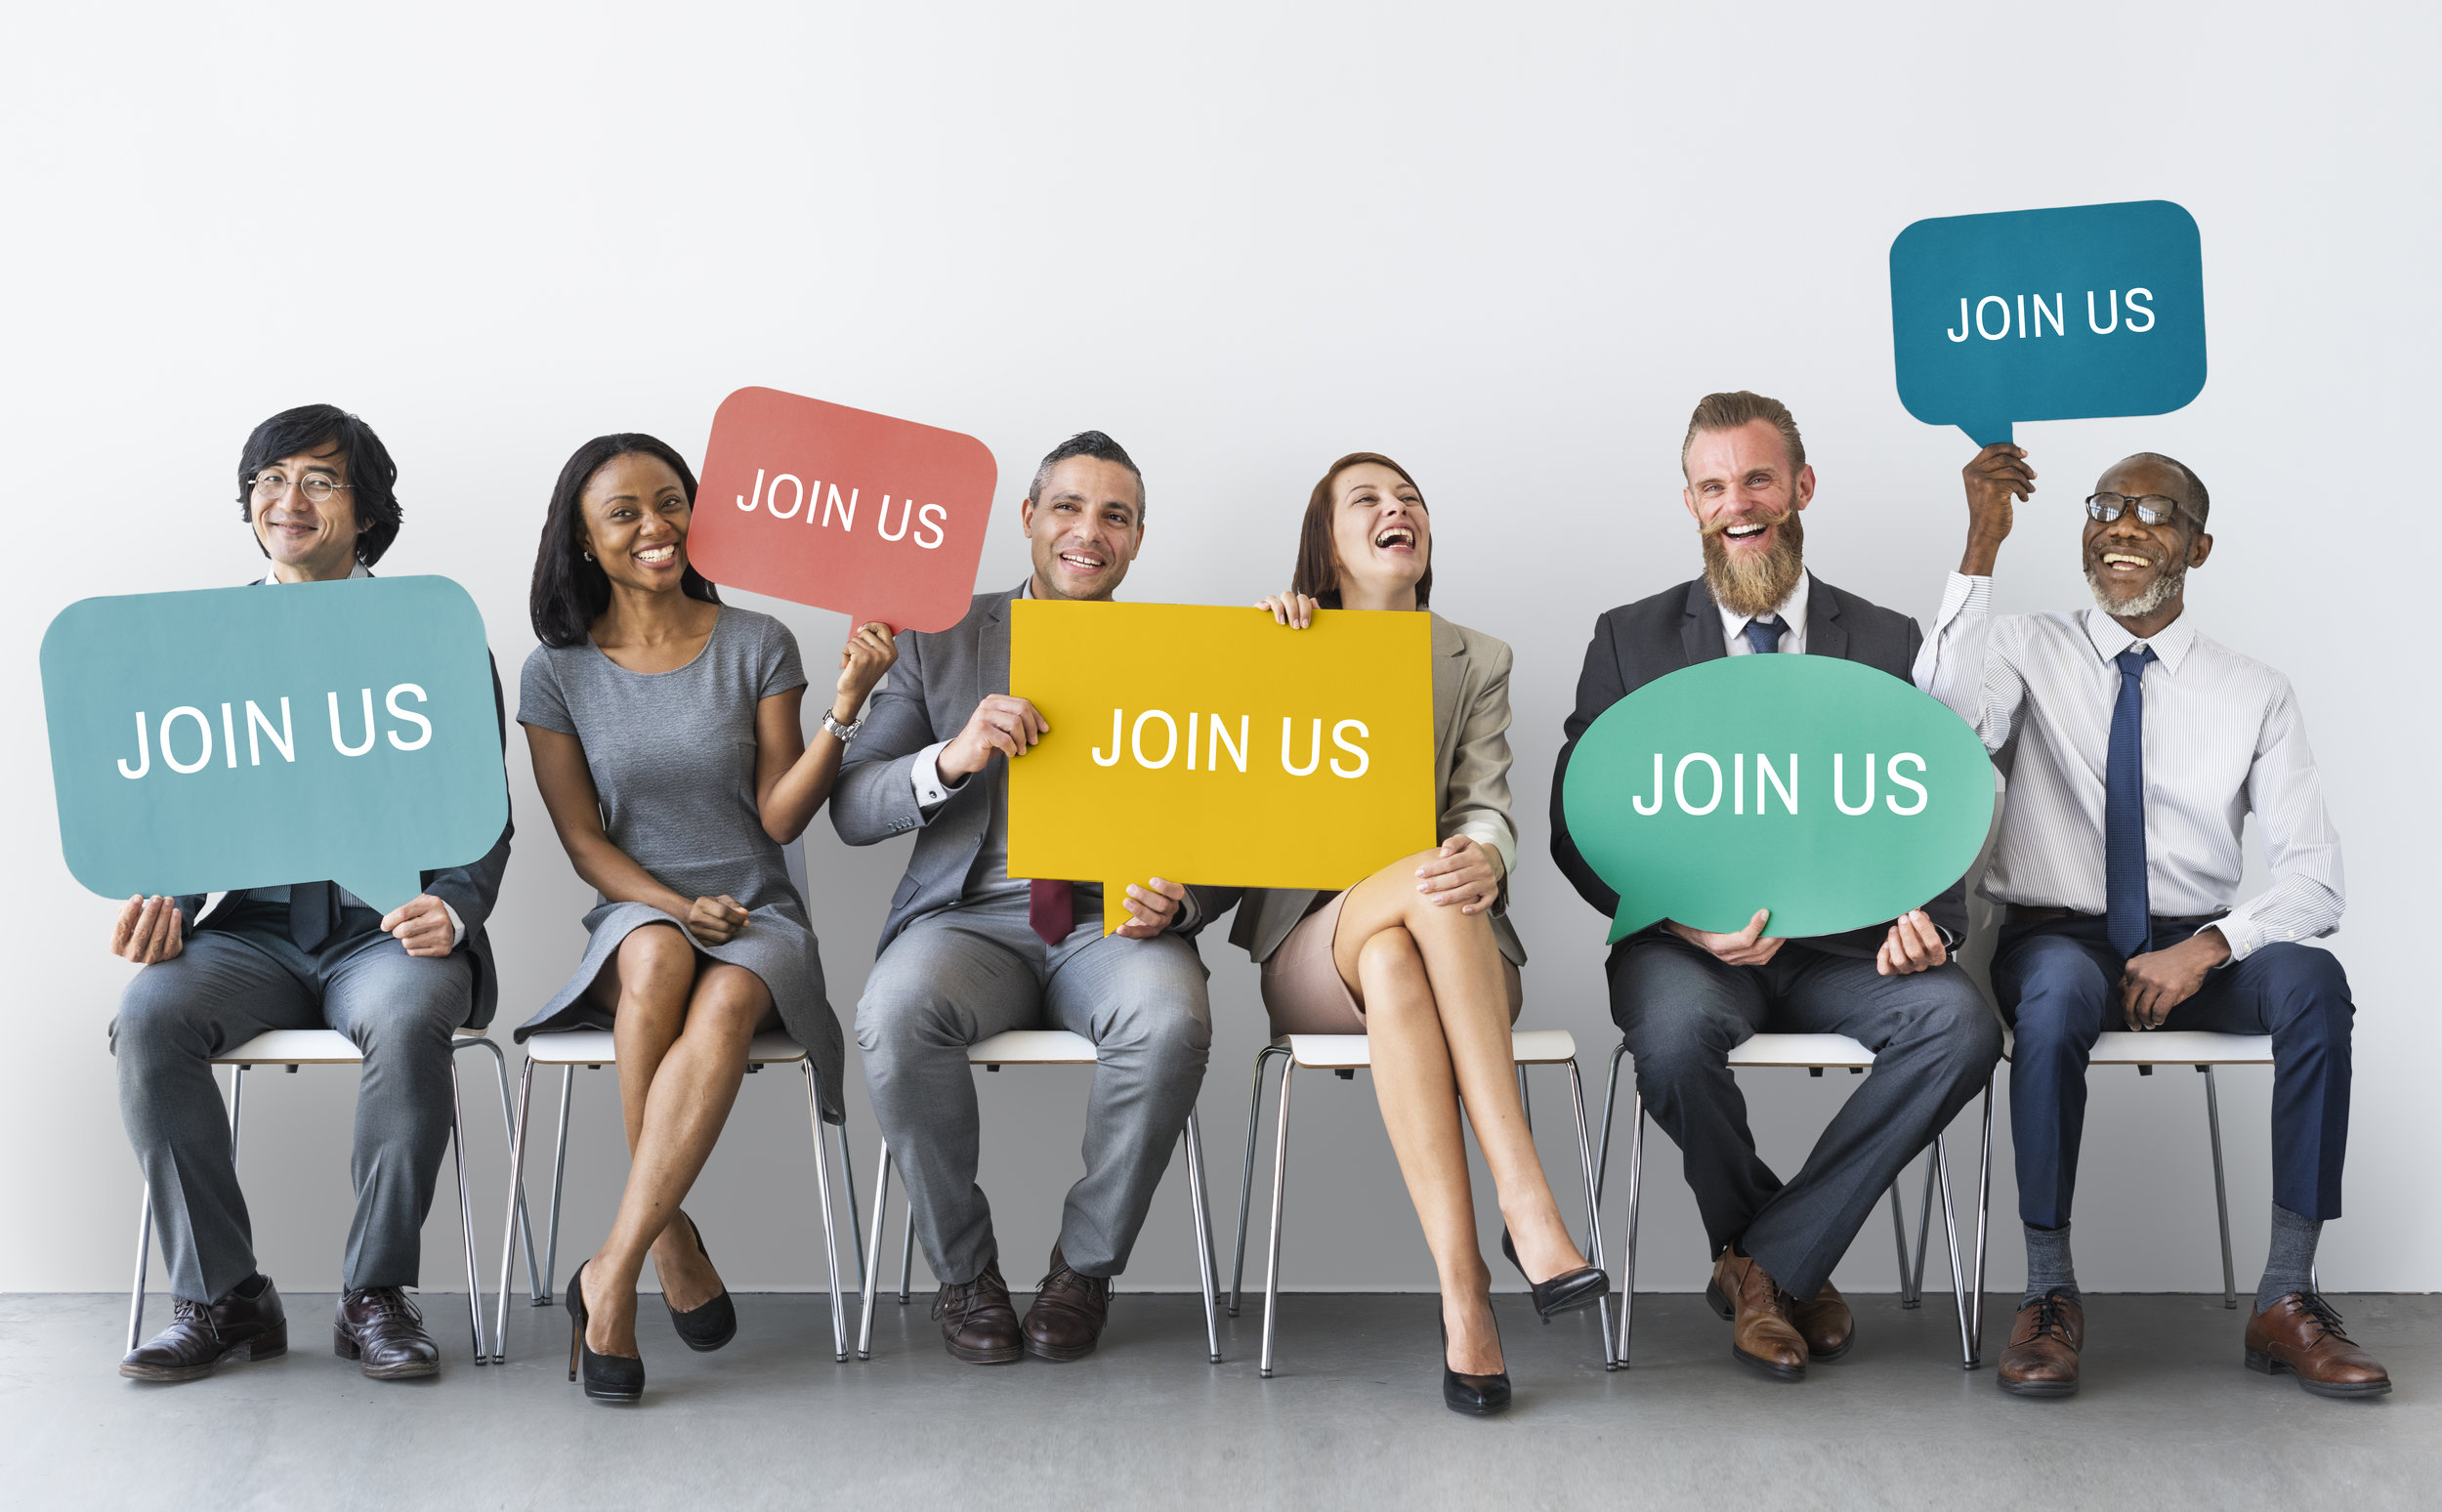 hiring in australia - majer recruitment